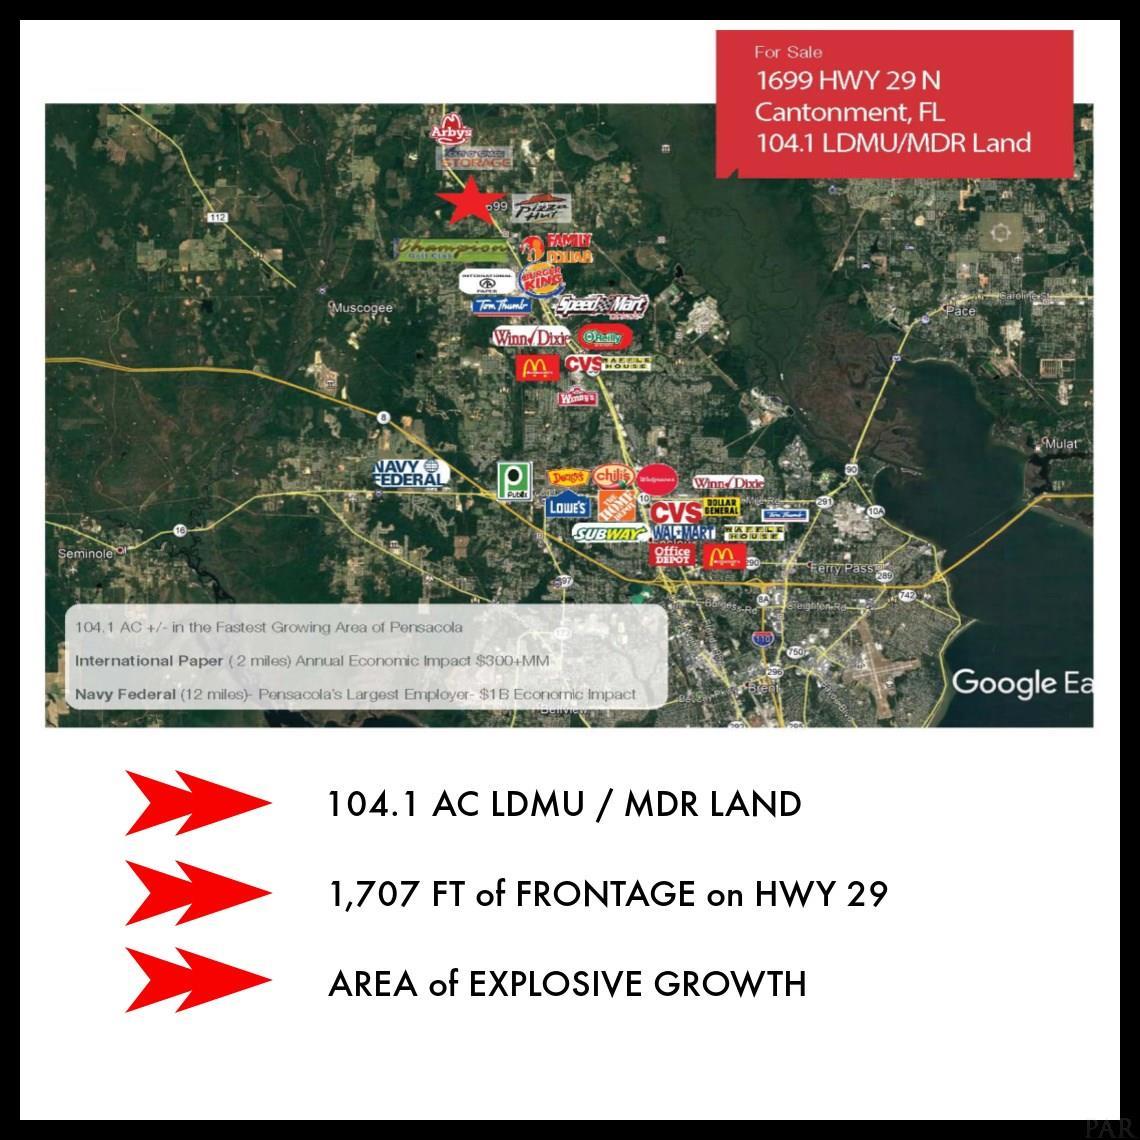 1699 N HWY 29, CANTONMENT, FL 32533